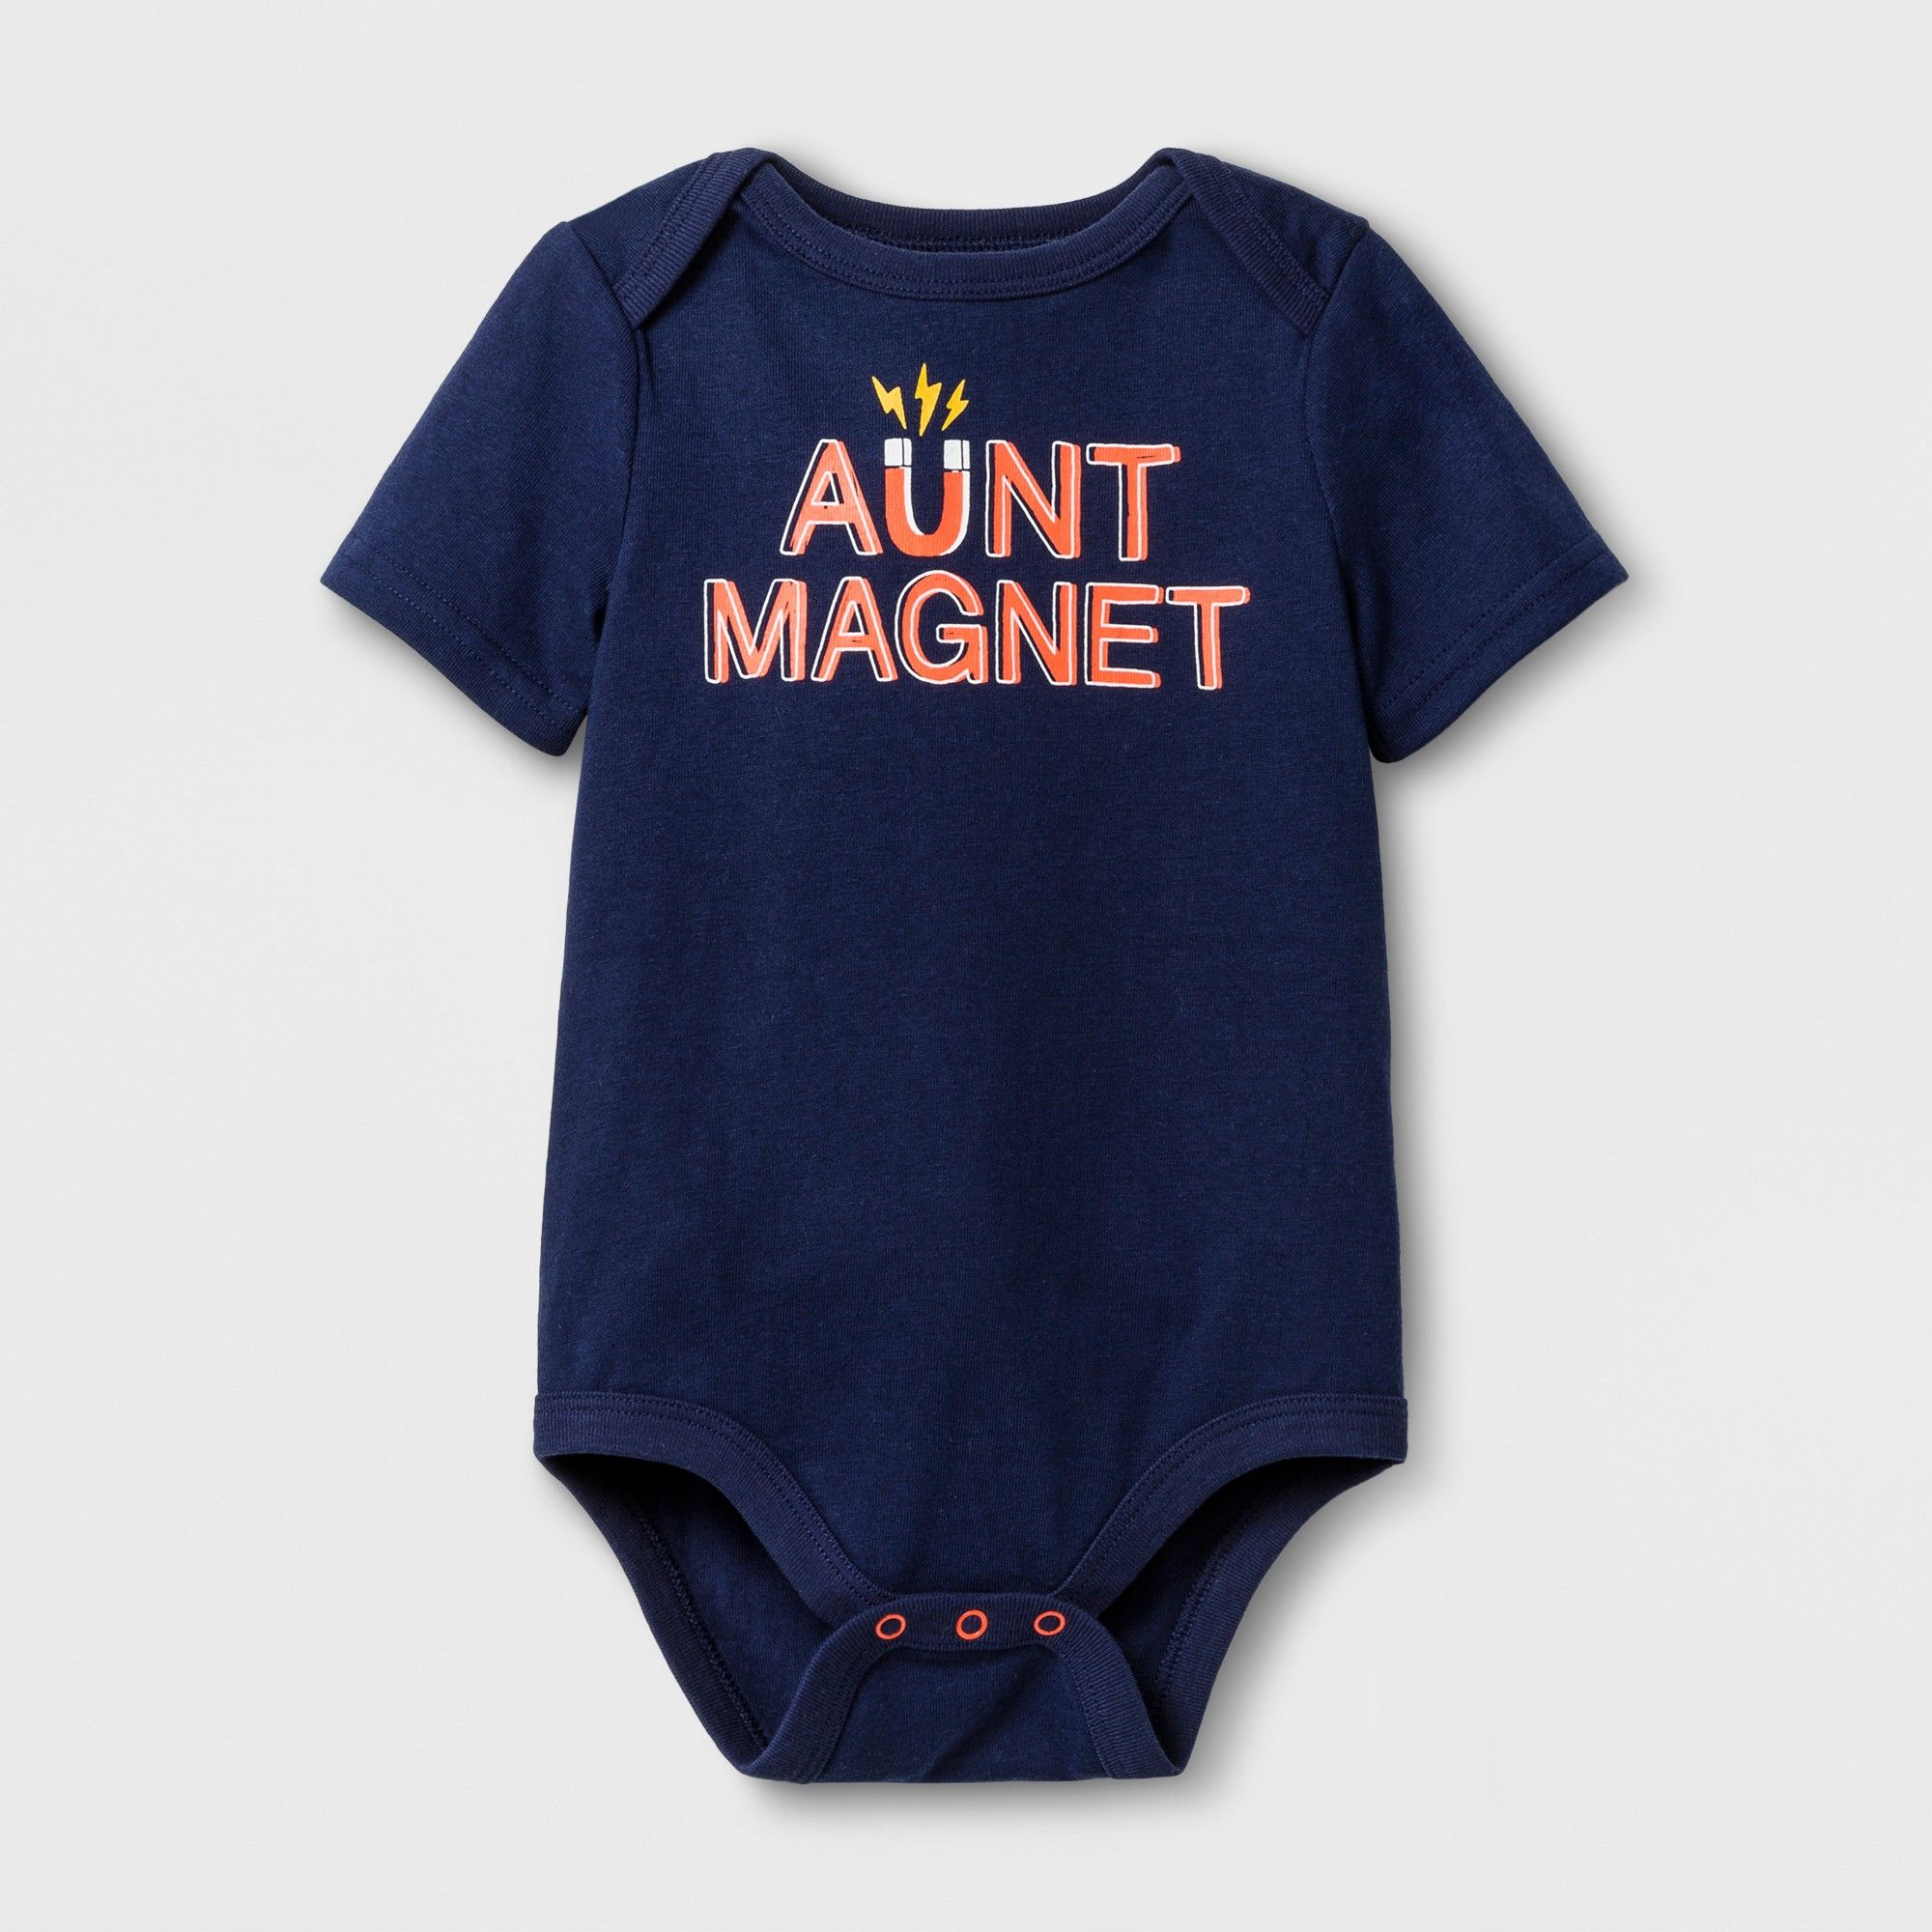 Baby Boys Short Sleeve Aunt Magnet Bodysuit Cat & Jack